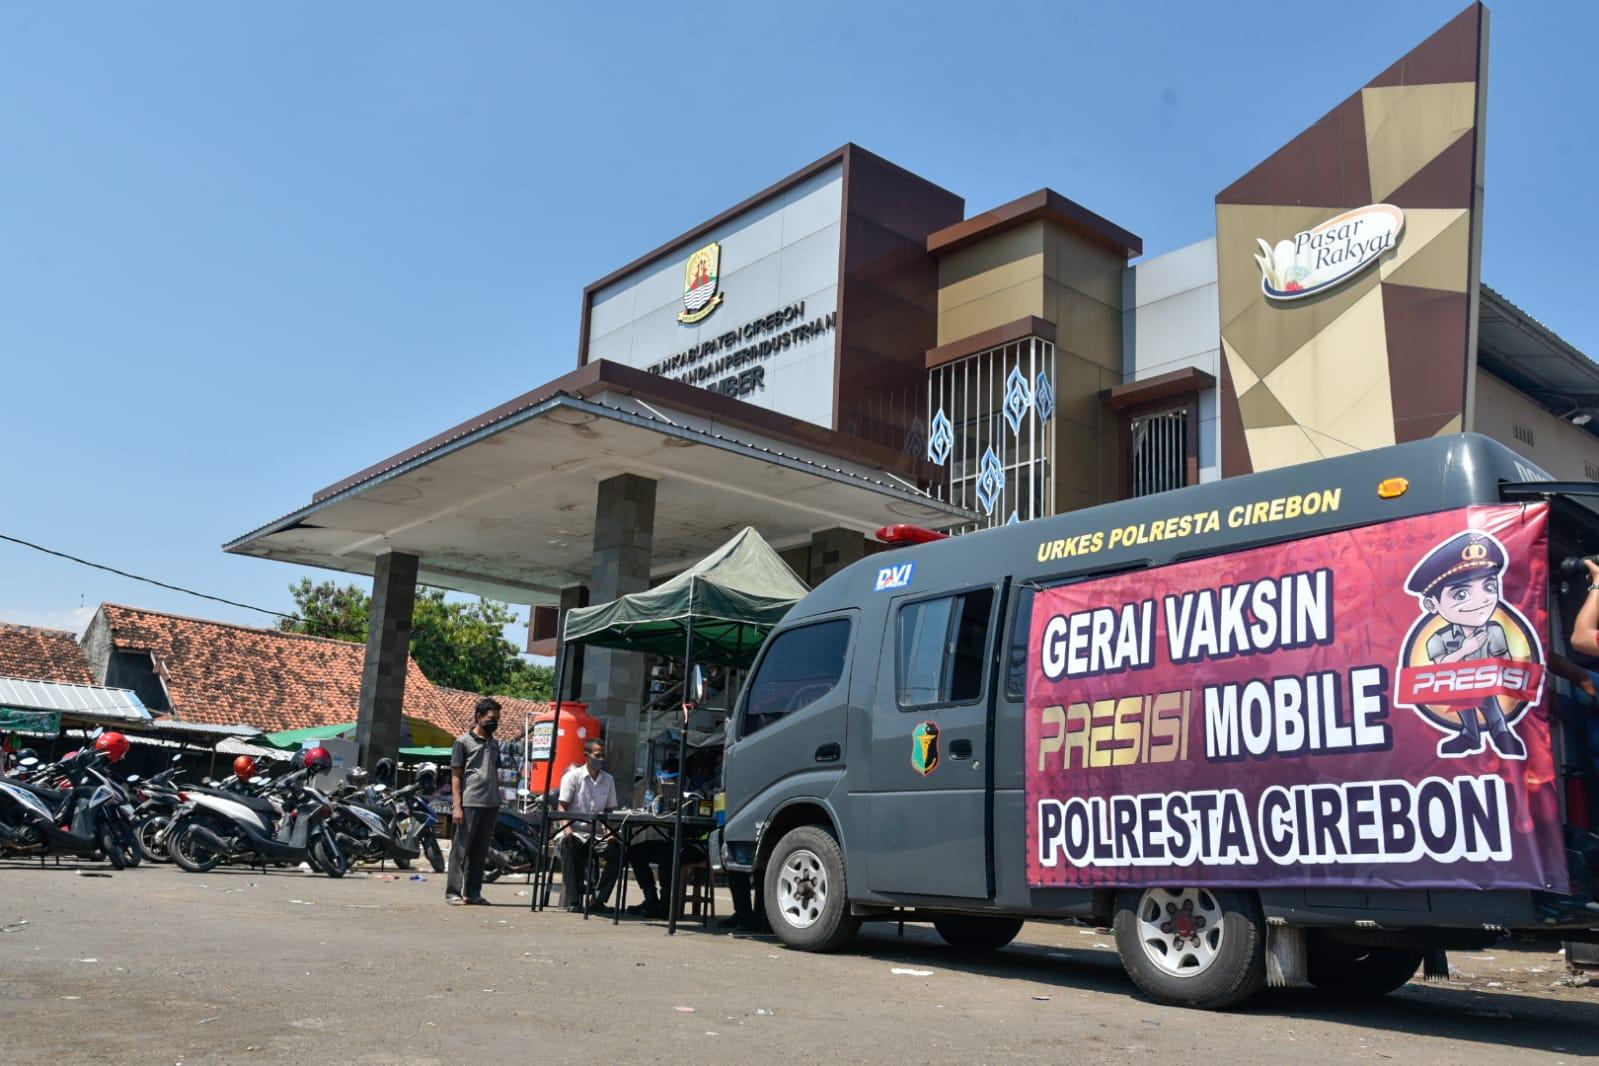 Sejumlah Pasar Tradisional Jadi Sasaran Gerai Vaksin Presisi Mobile Polresta Cirebon